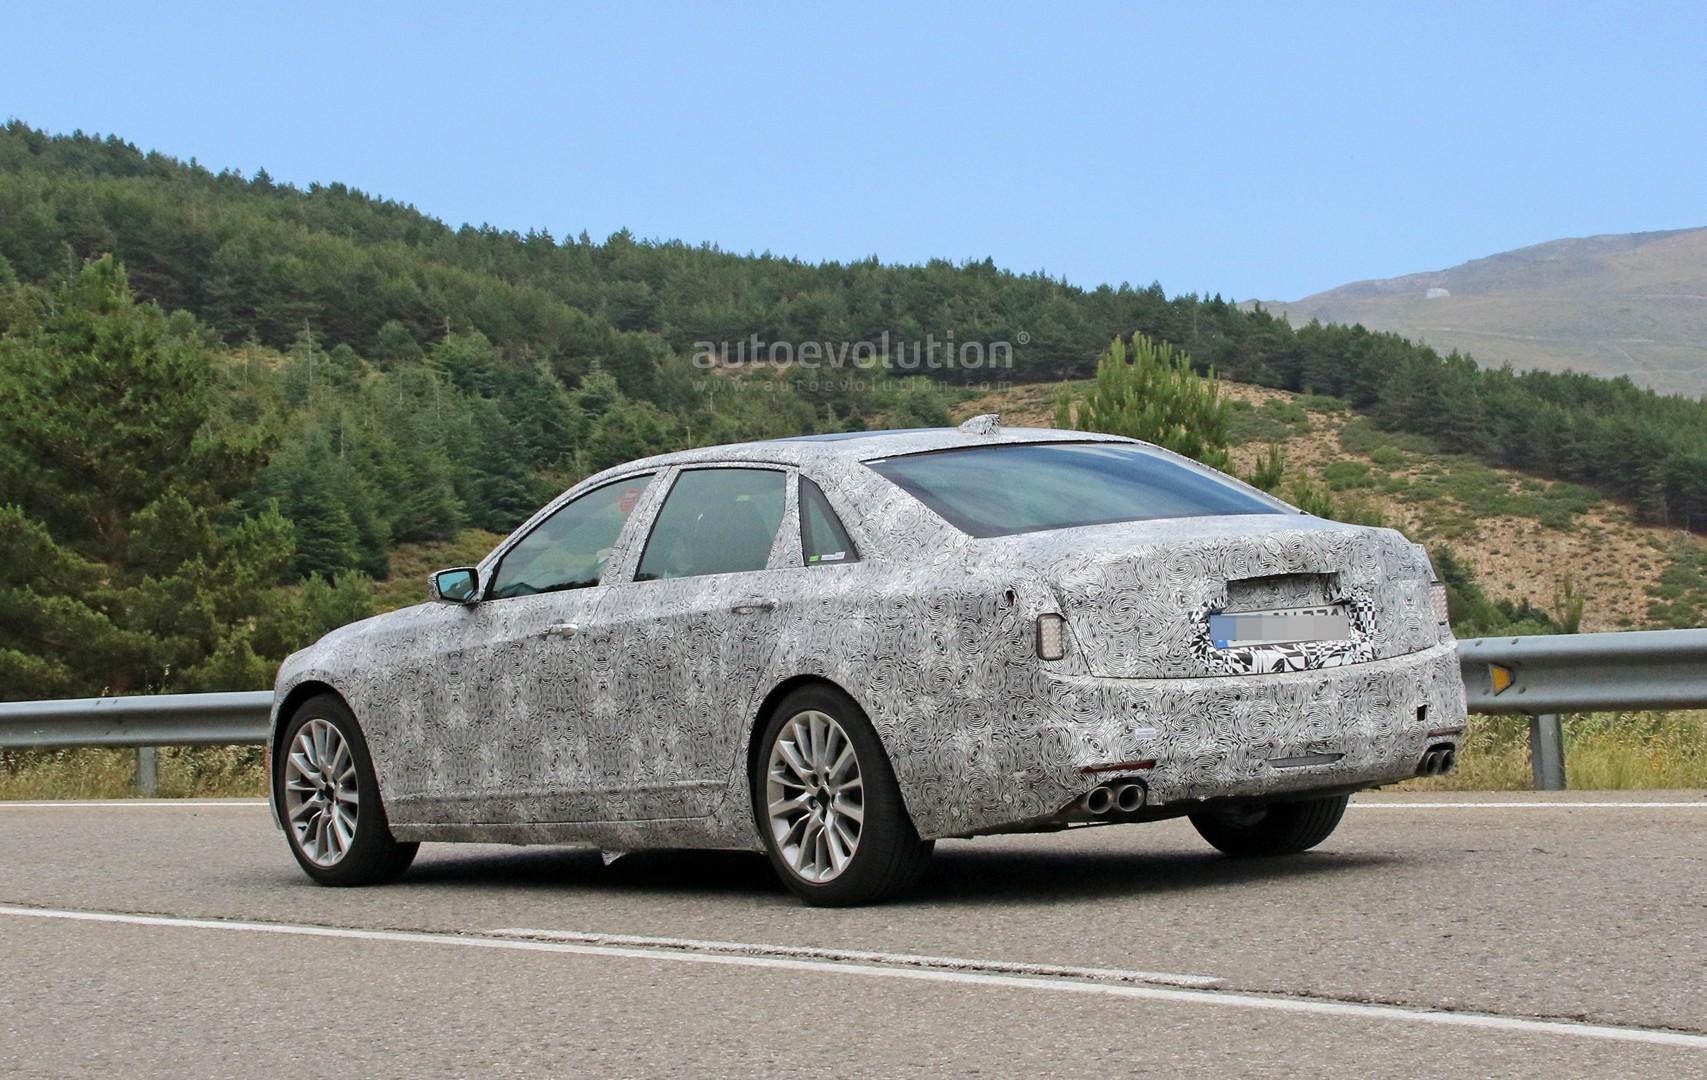 2019 Cadillac Ct6 Facelift Makes Spyshots Debut Has Escala Styling Autoevolution